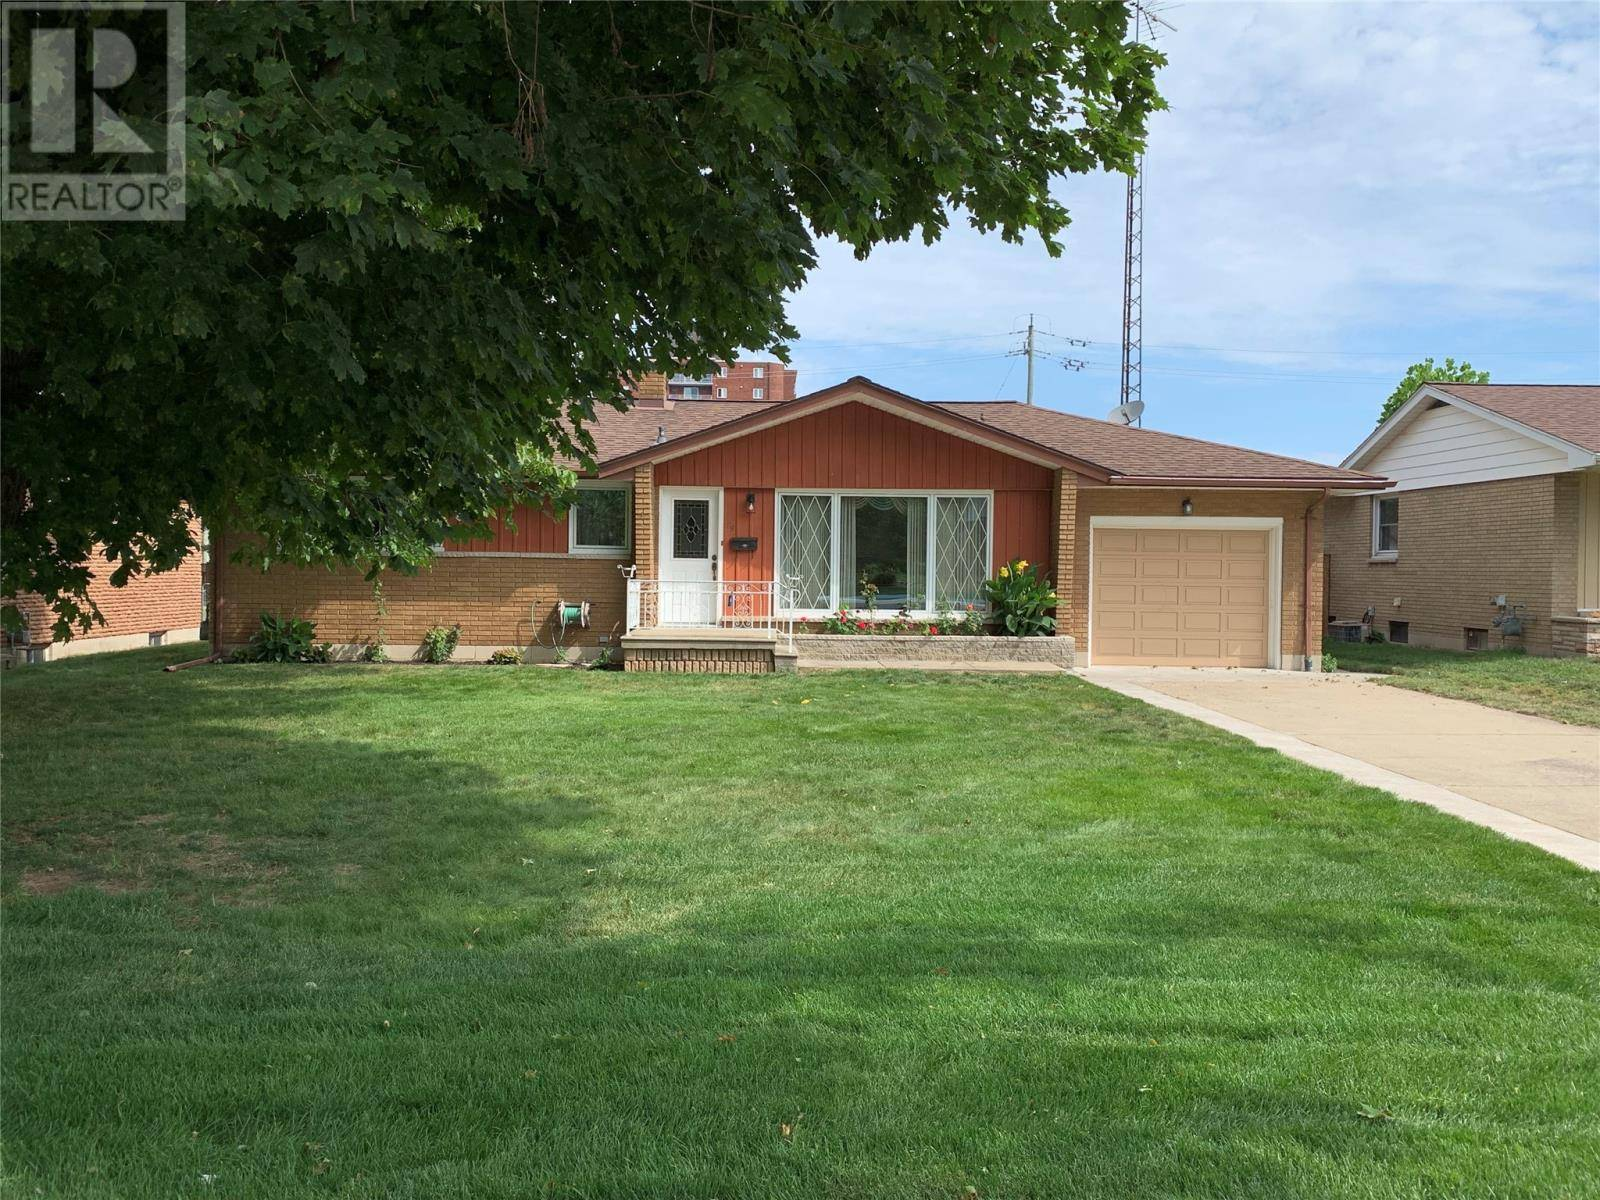 House for sale at 29 Coronation  Leamington Ontario - MLS: 19023645